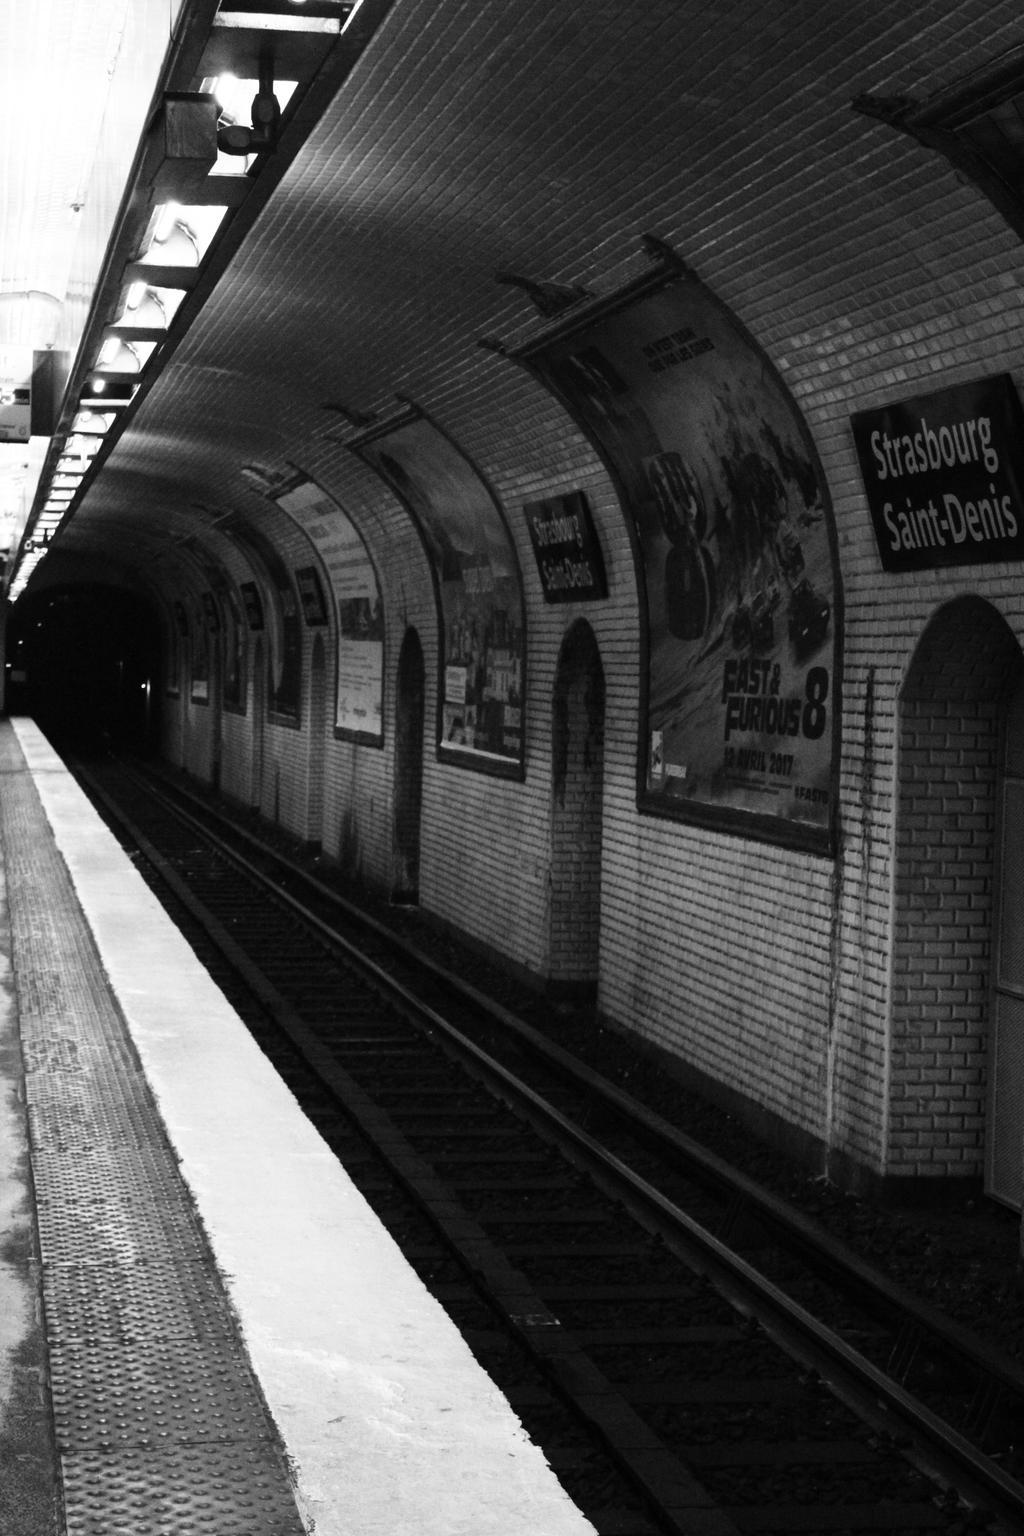 Subway station strasbourg saint denis in paris by - Lidl strasbourg saint denis ...